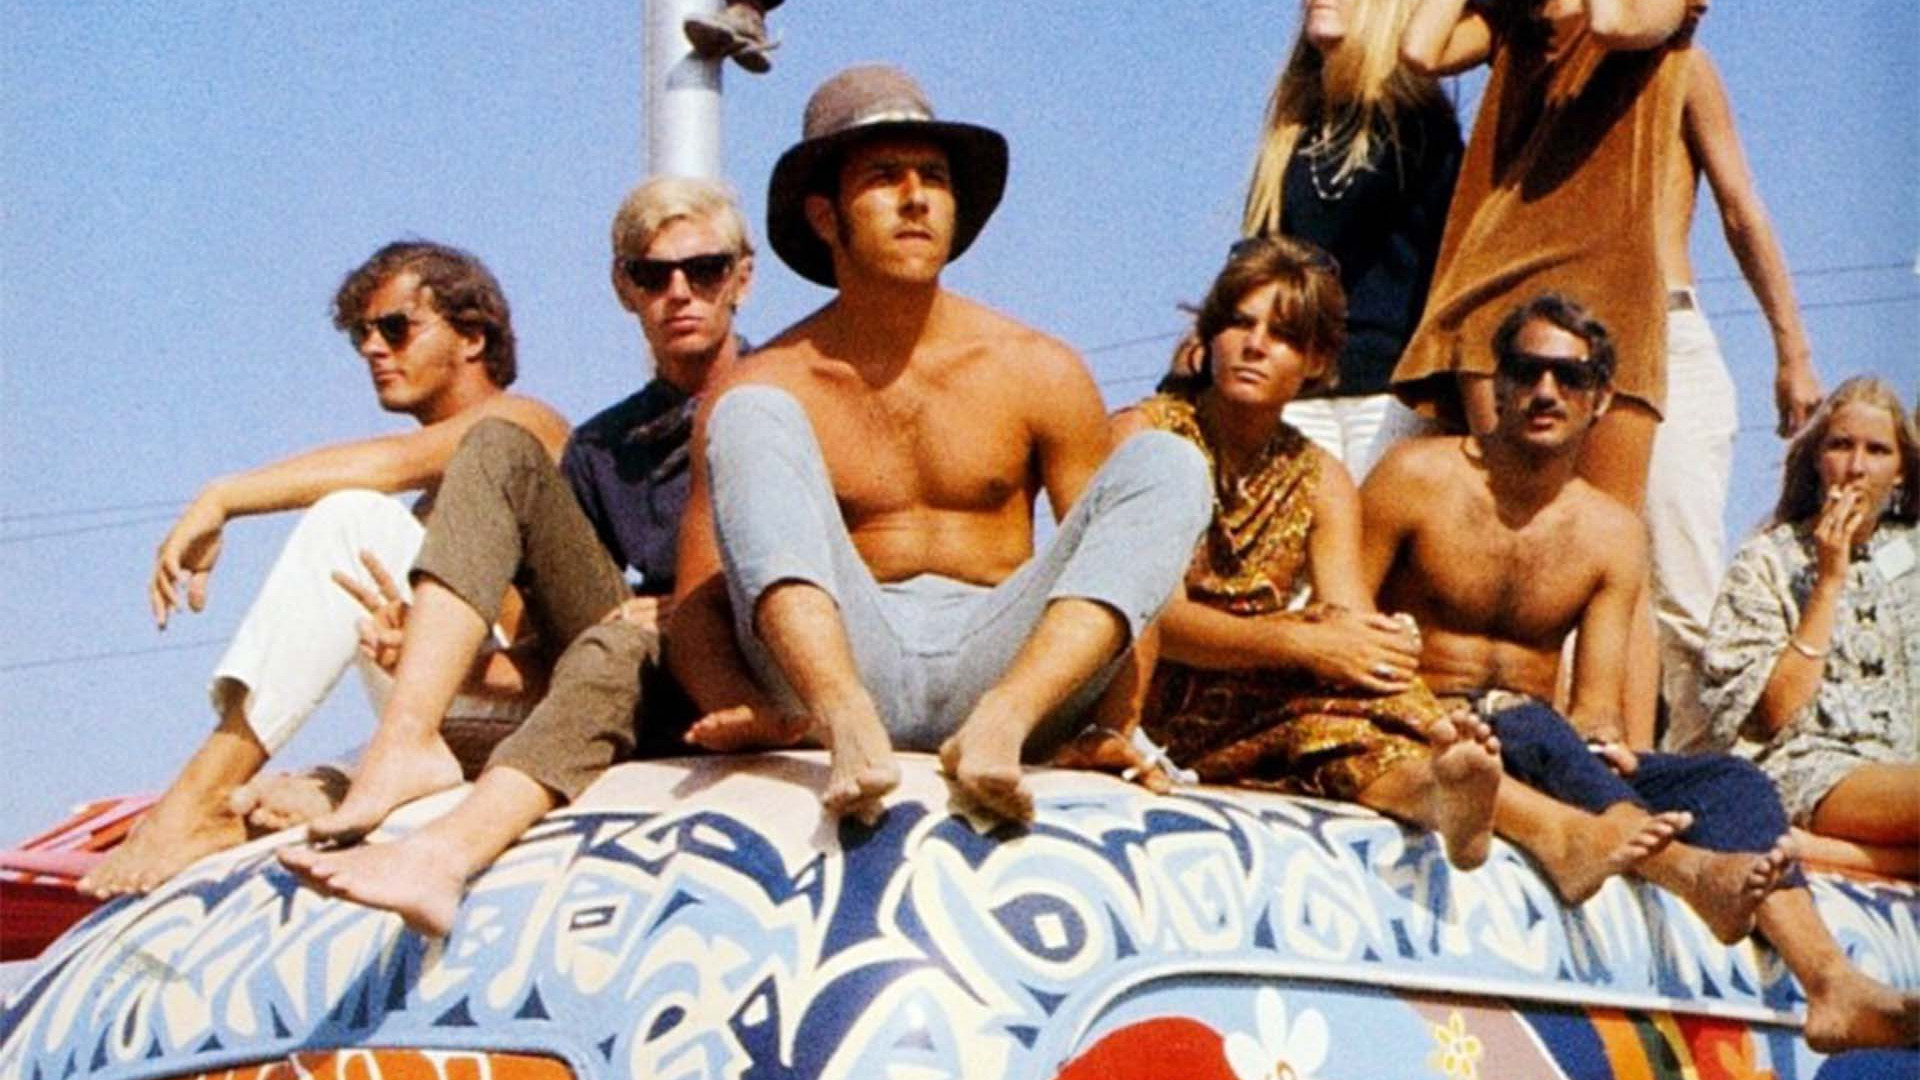 Festivalgoers at Woodstock